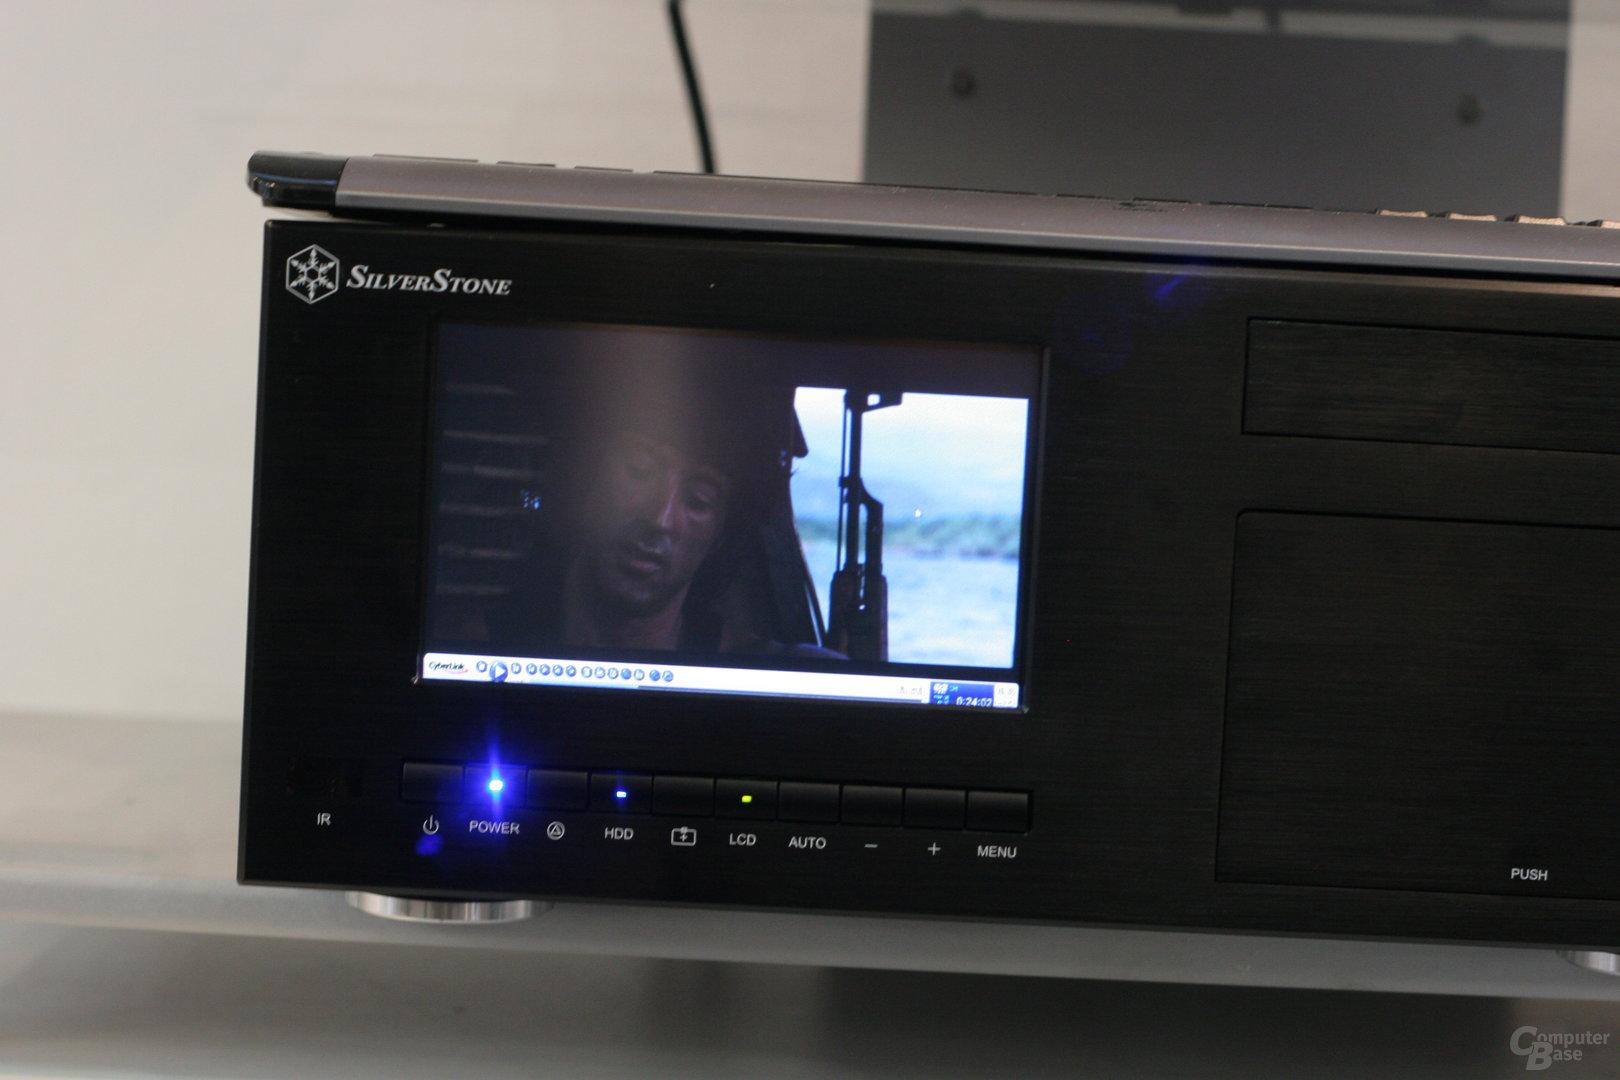 Silverstone CW03 Touchscreen